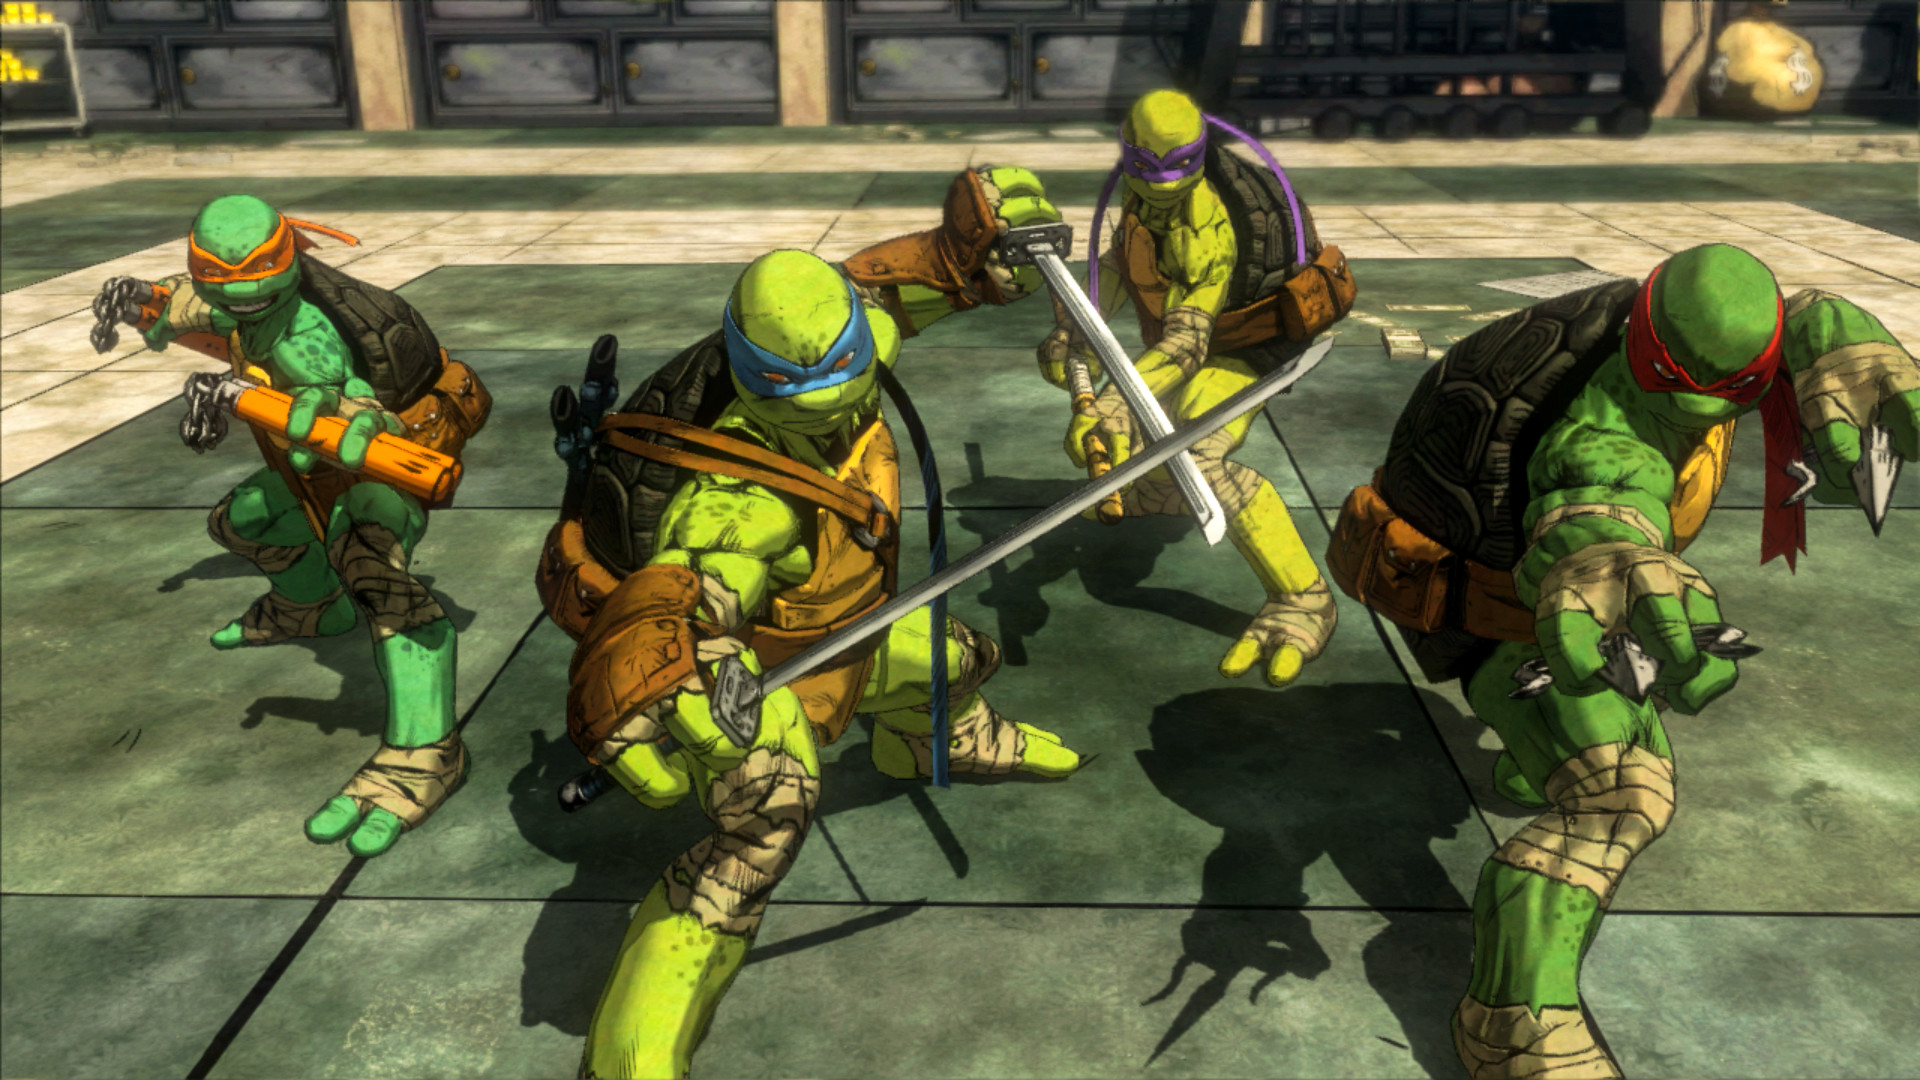 Teenage Mutant Ninja Turtles Mutants In Manhattan ESPAÑOL PC Full (CODEX) + REPACK 2 DVD5 (JPW) 10